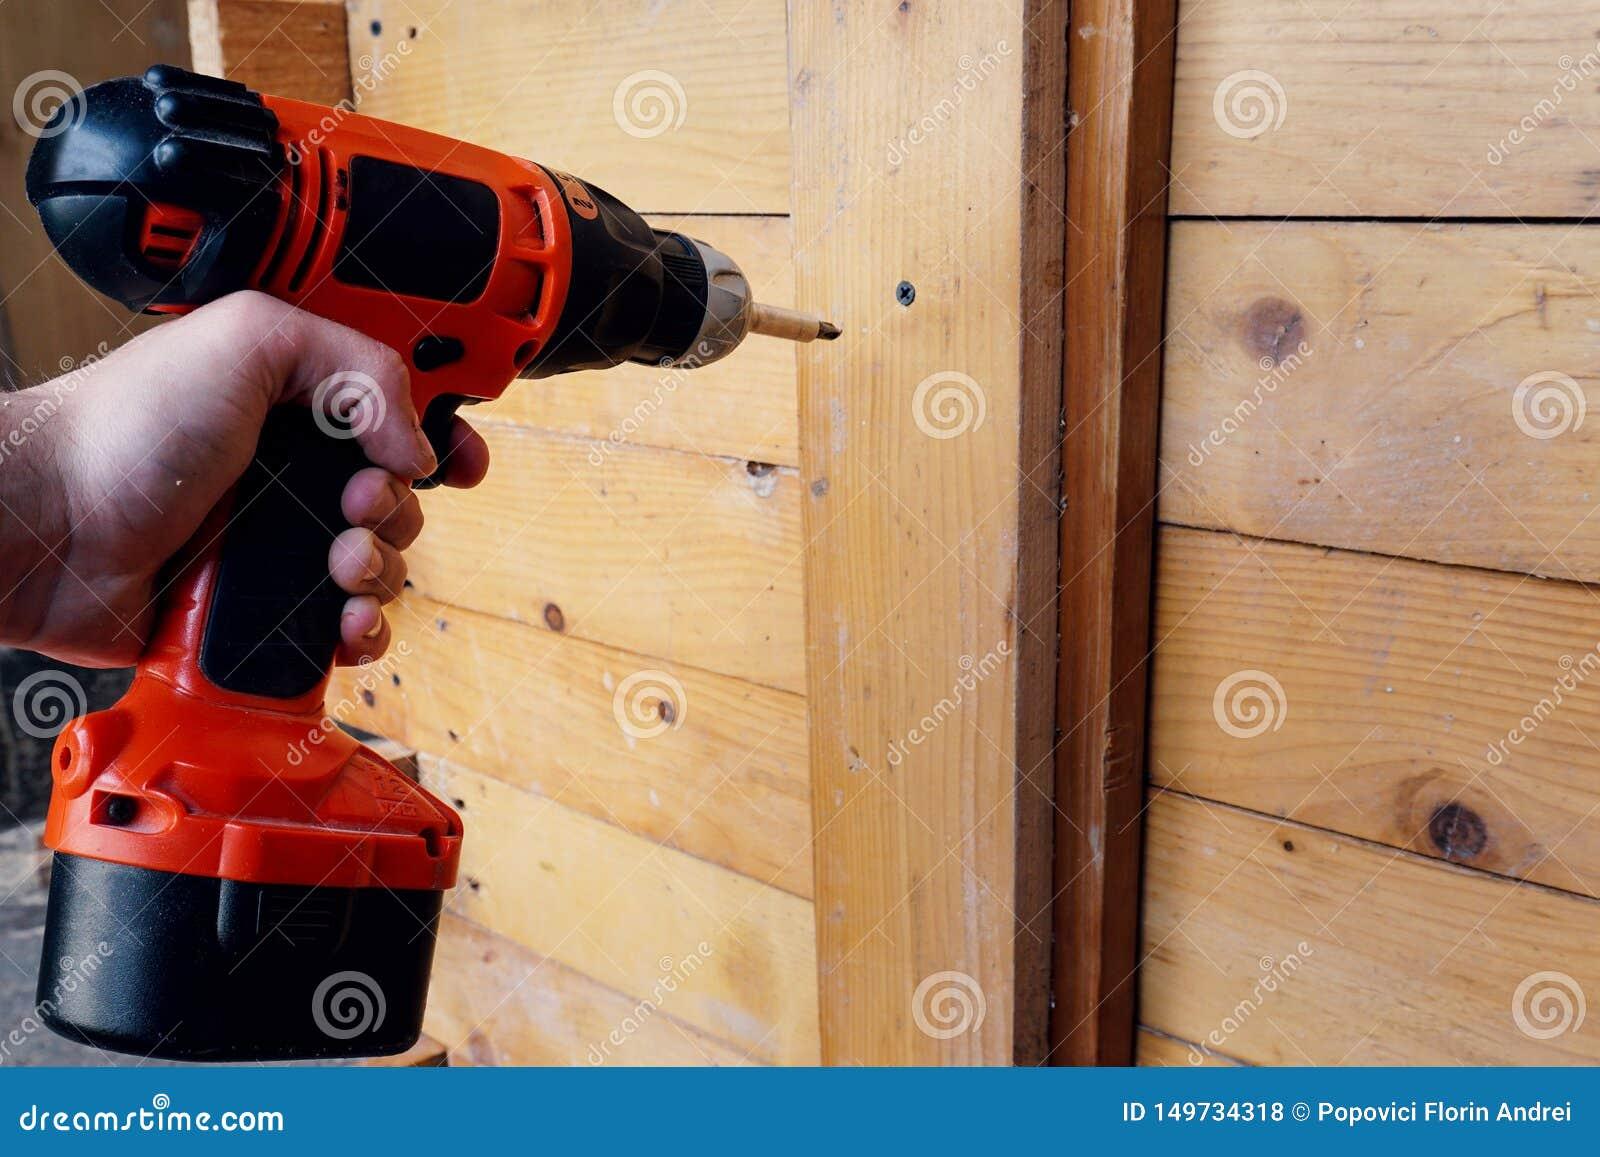 A man using a electric screwdriver